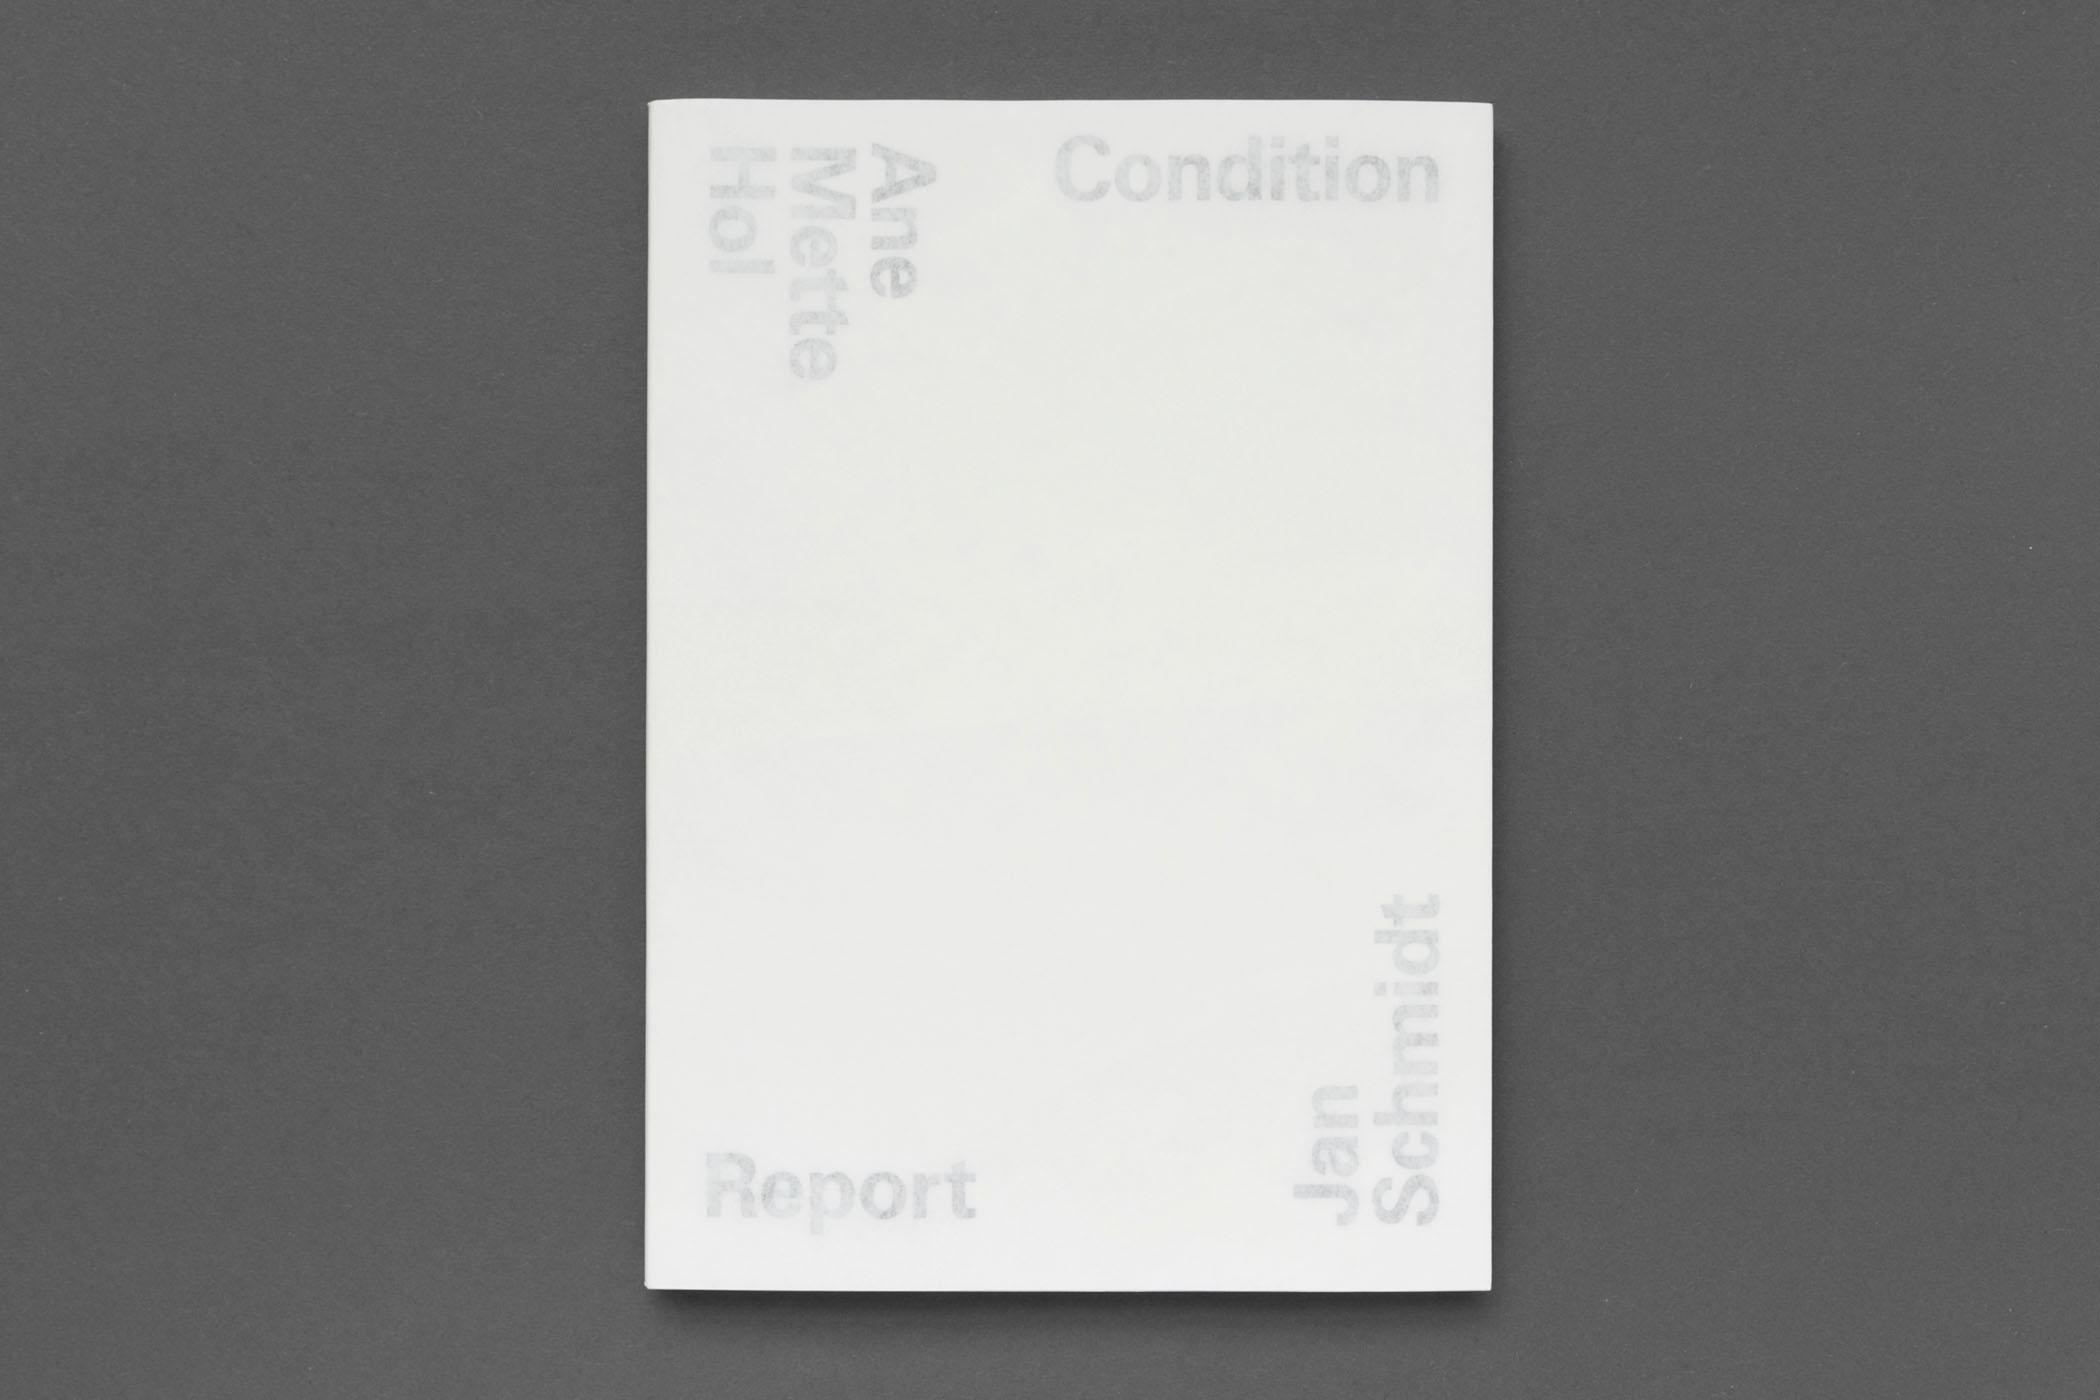 Ane Mette Hol, Jan Schmidt: Condition Report